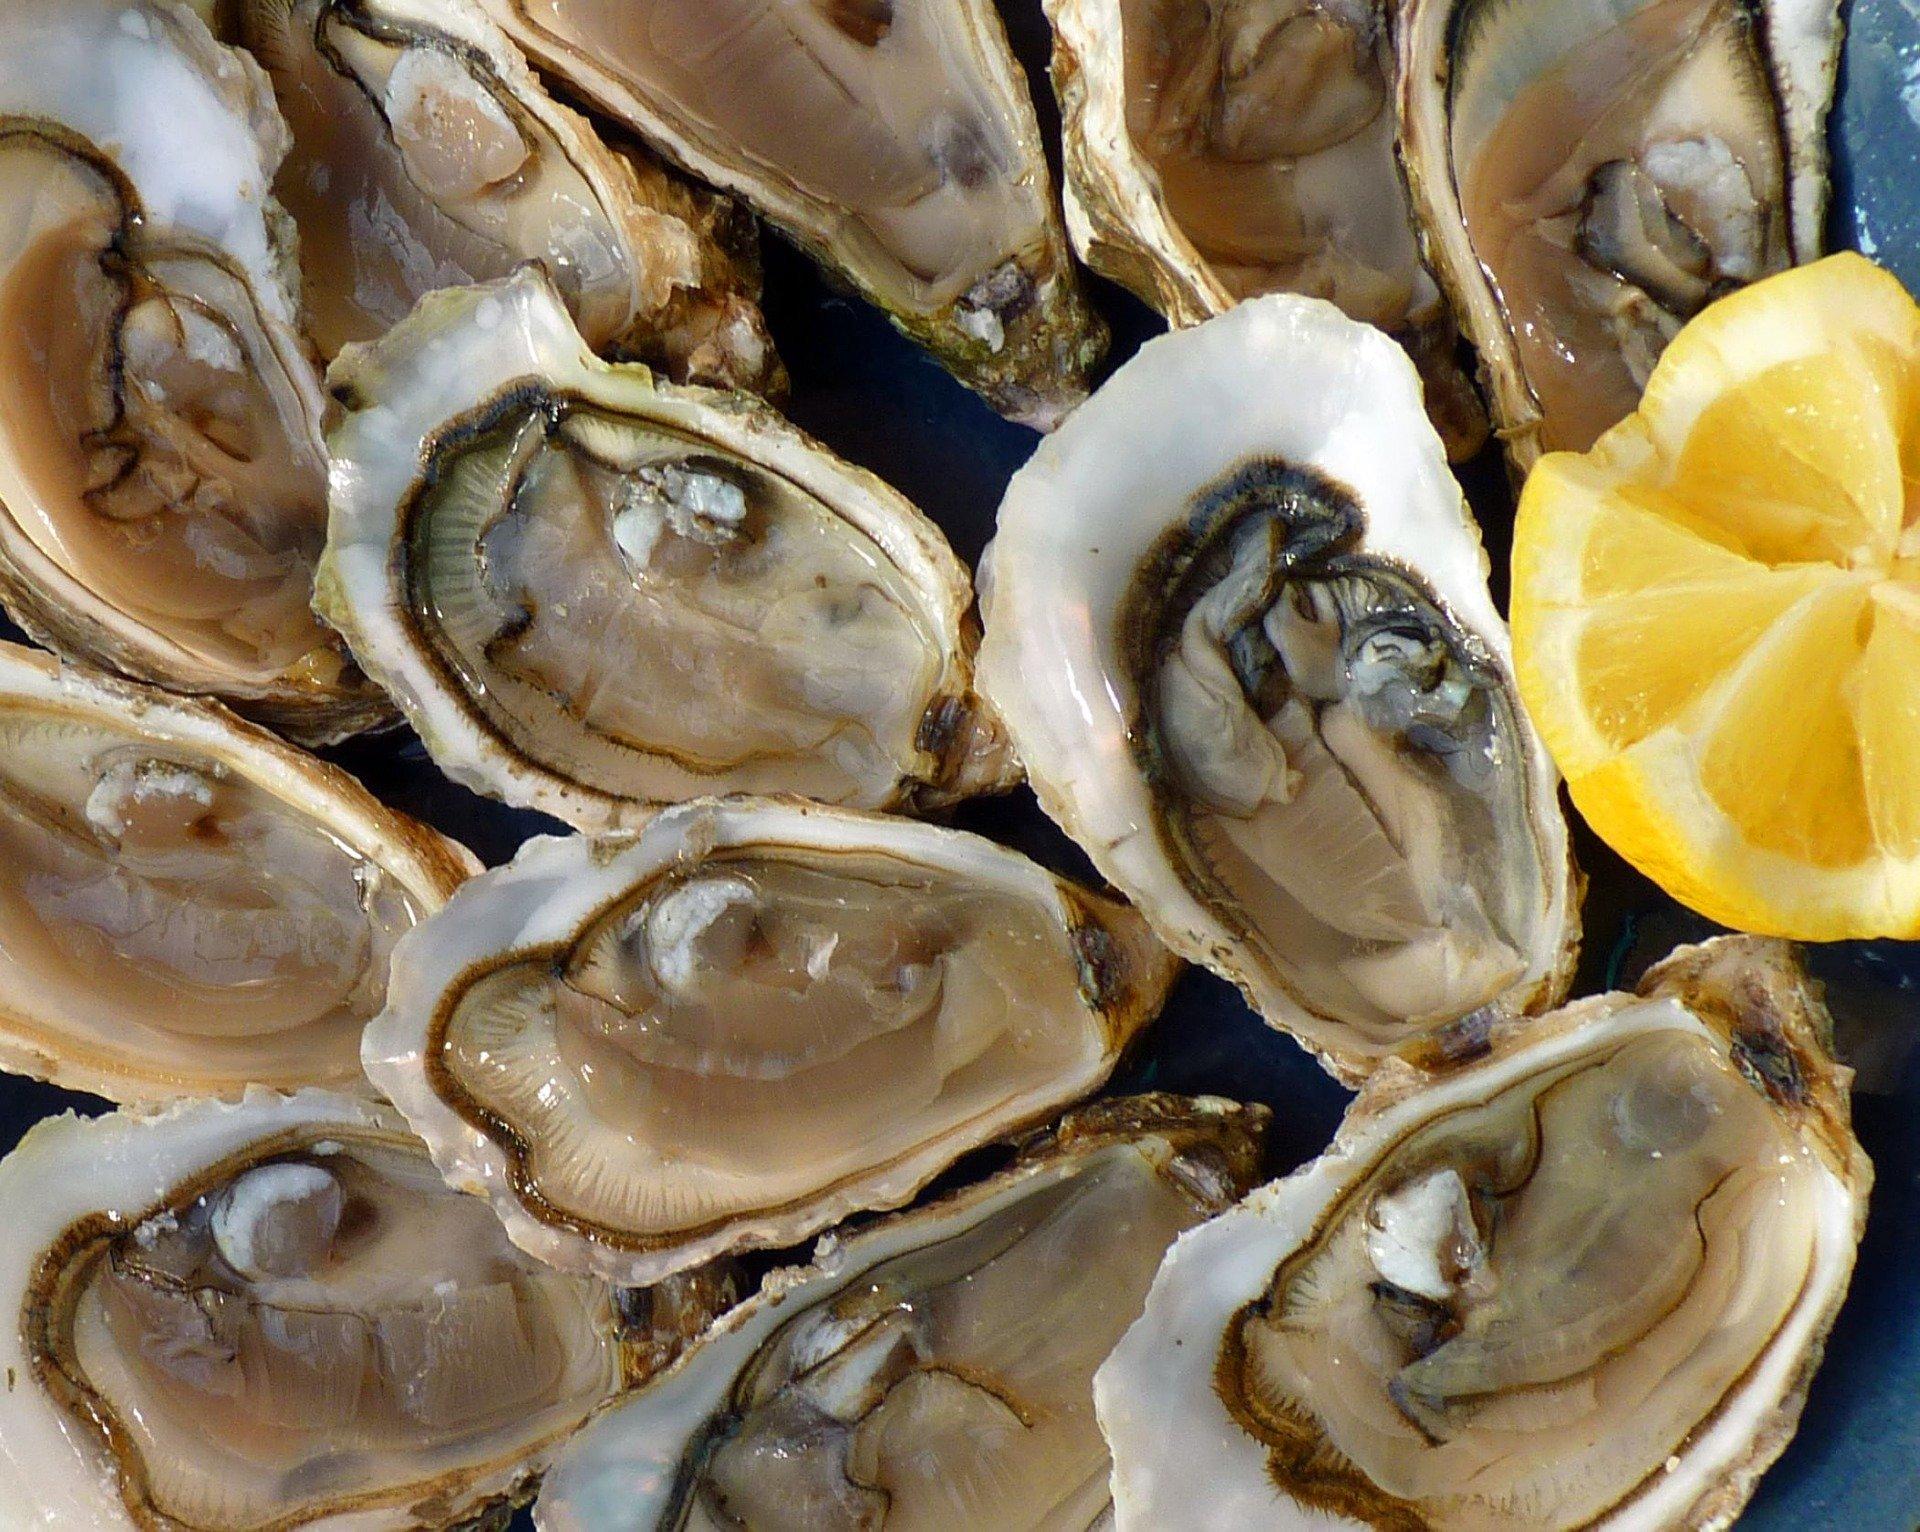 oysters 1958668 1920 1024x817 - '겨울 별미' 굴 먹으면 노로바이러스 걸리는 '충격적' 이유